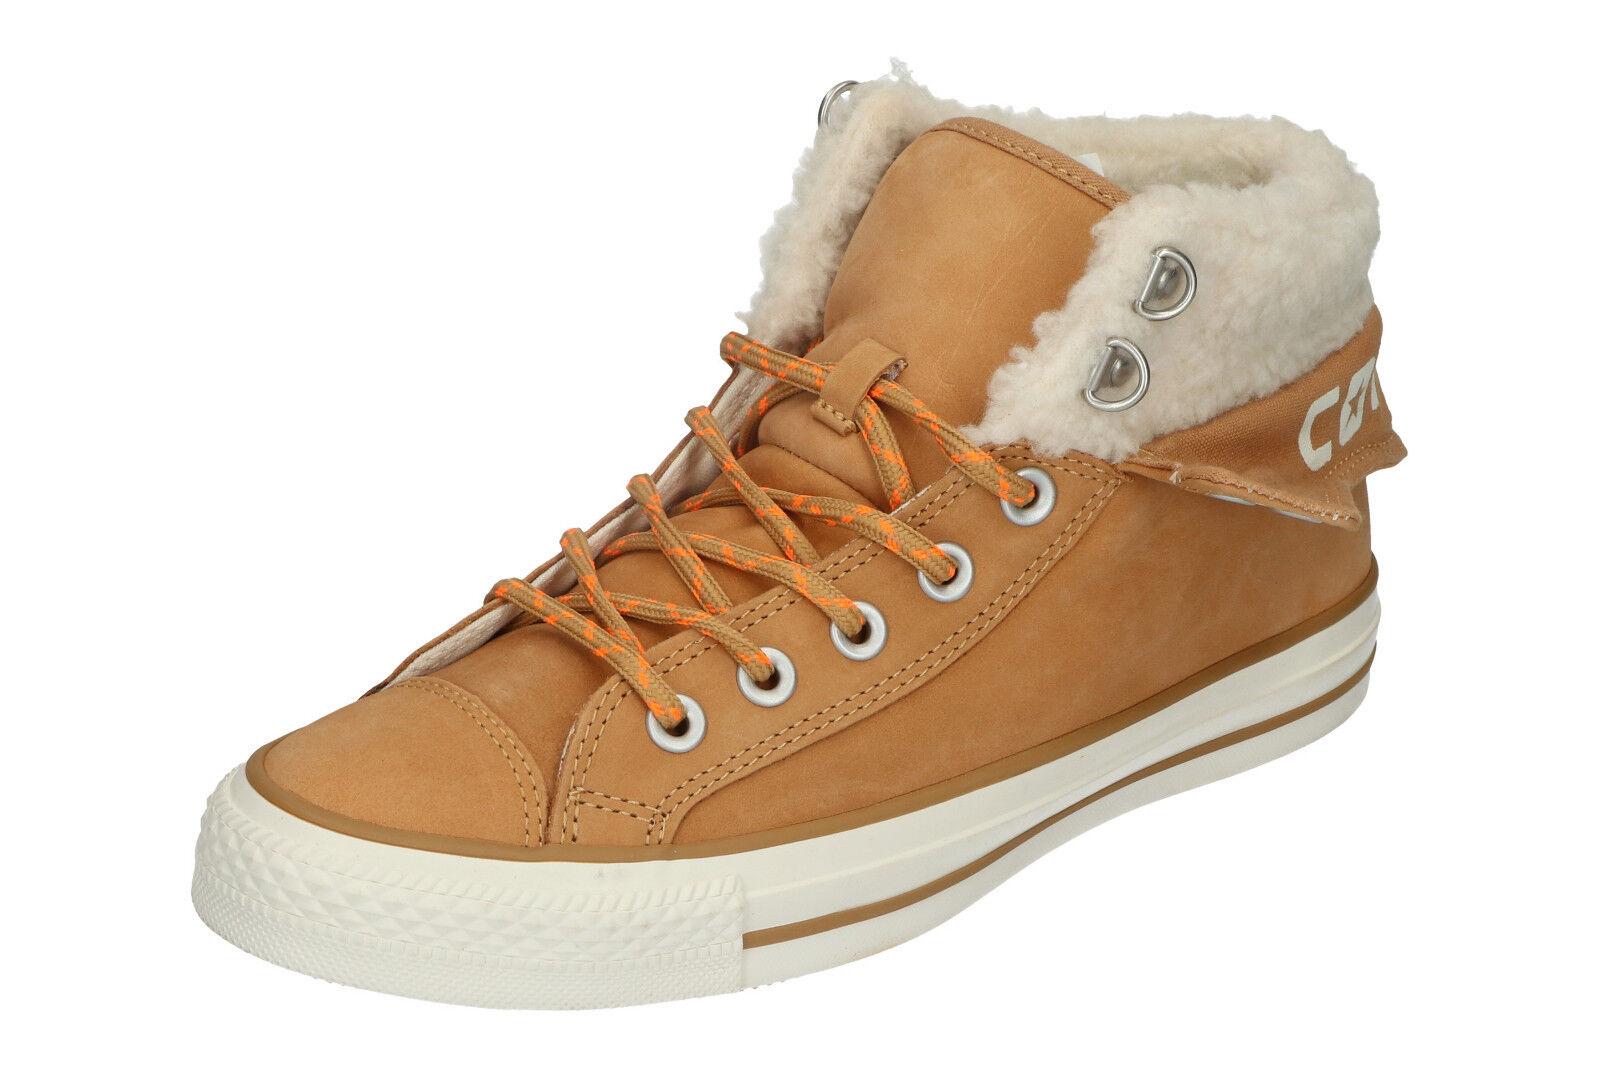 Converse (141974C) Sneaker - Unisex - 38 (UK 5 1/2) - Beige